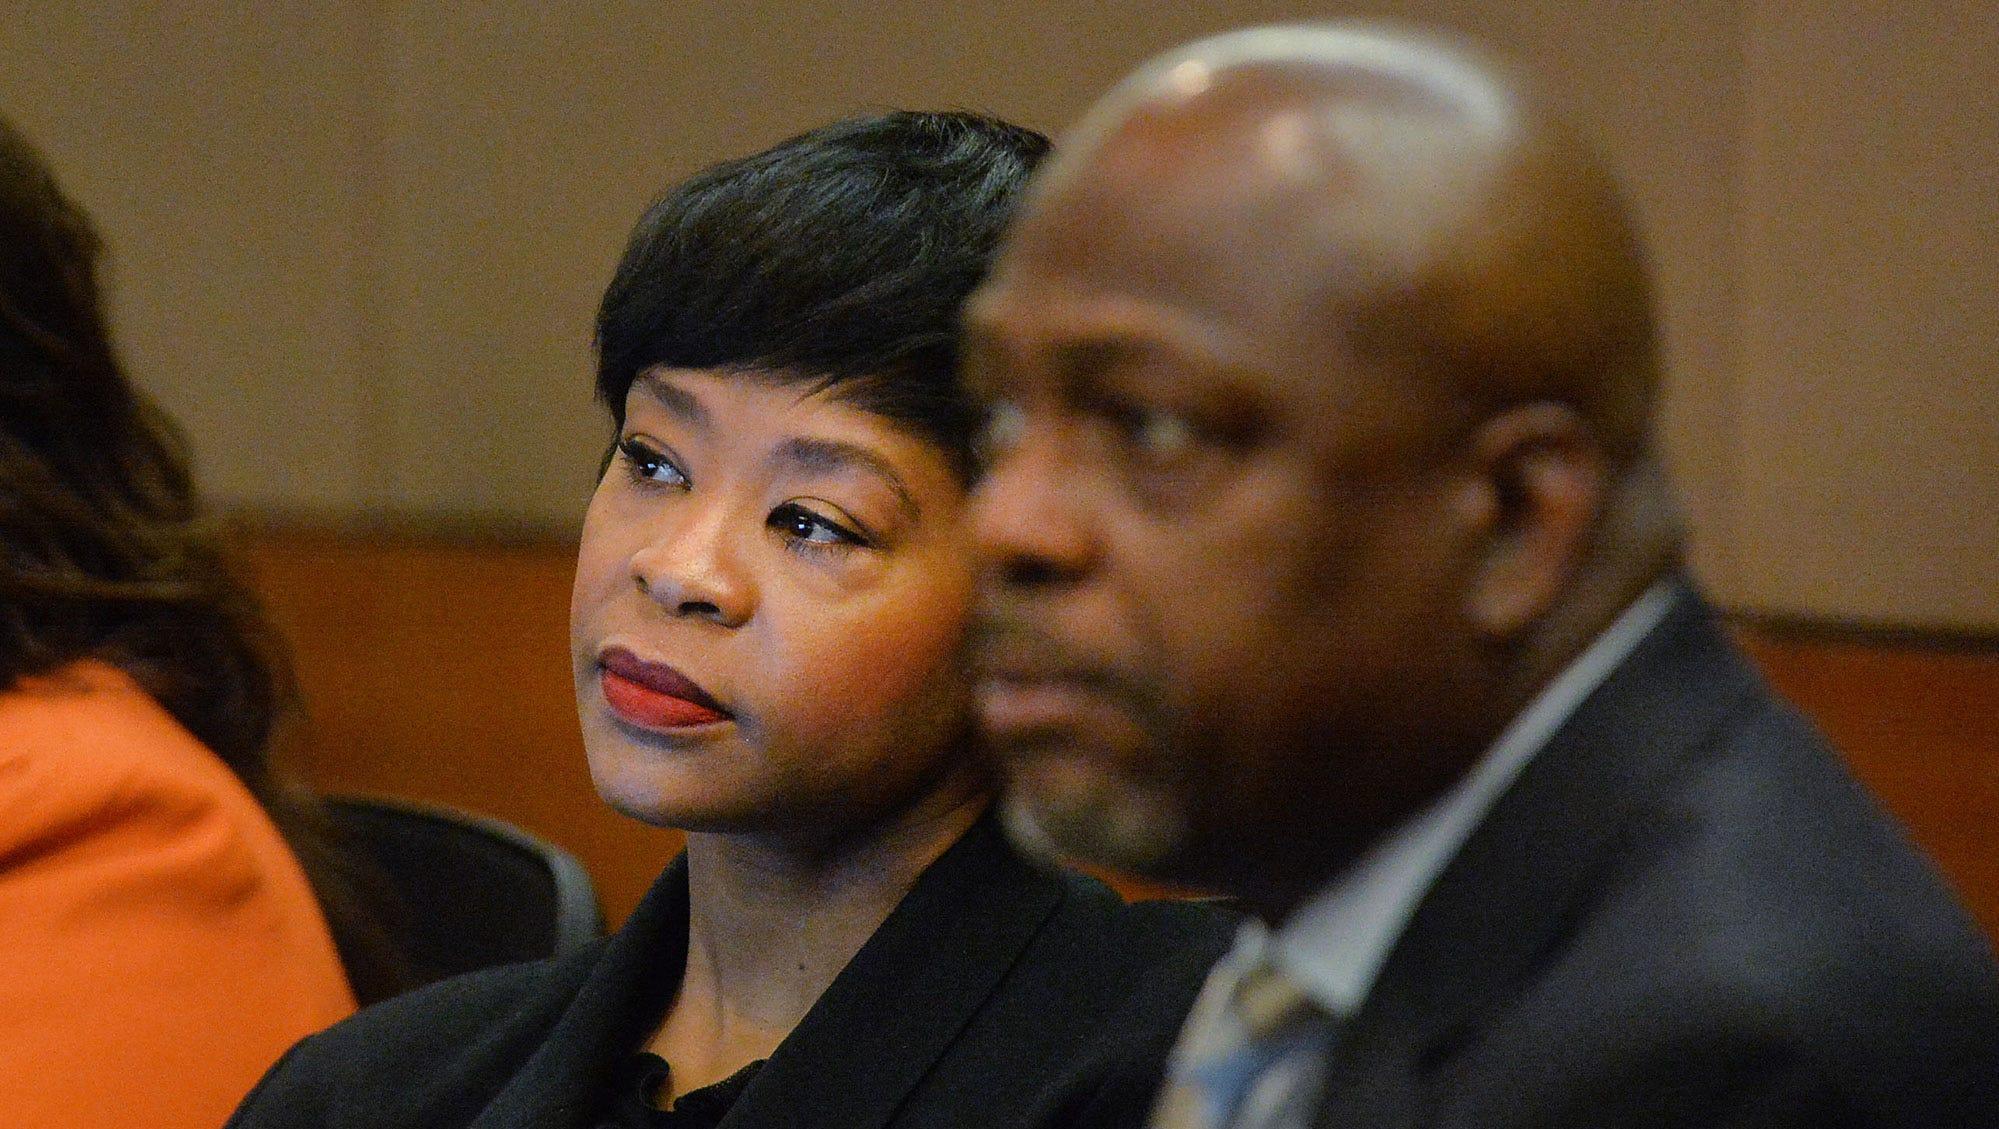 Cheating Case In Atlanta : Atlanta educators convicted in cheating scandal